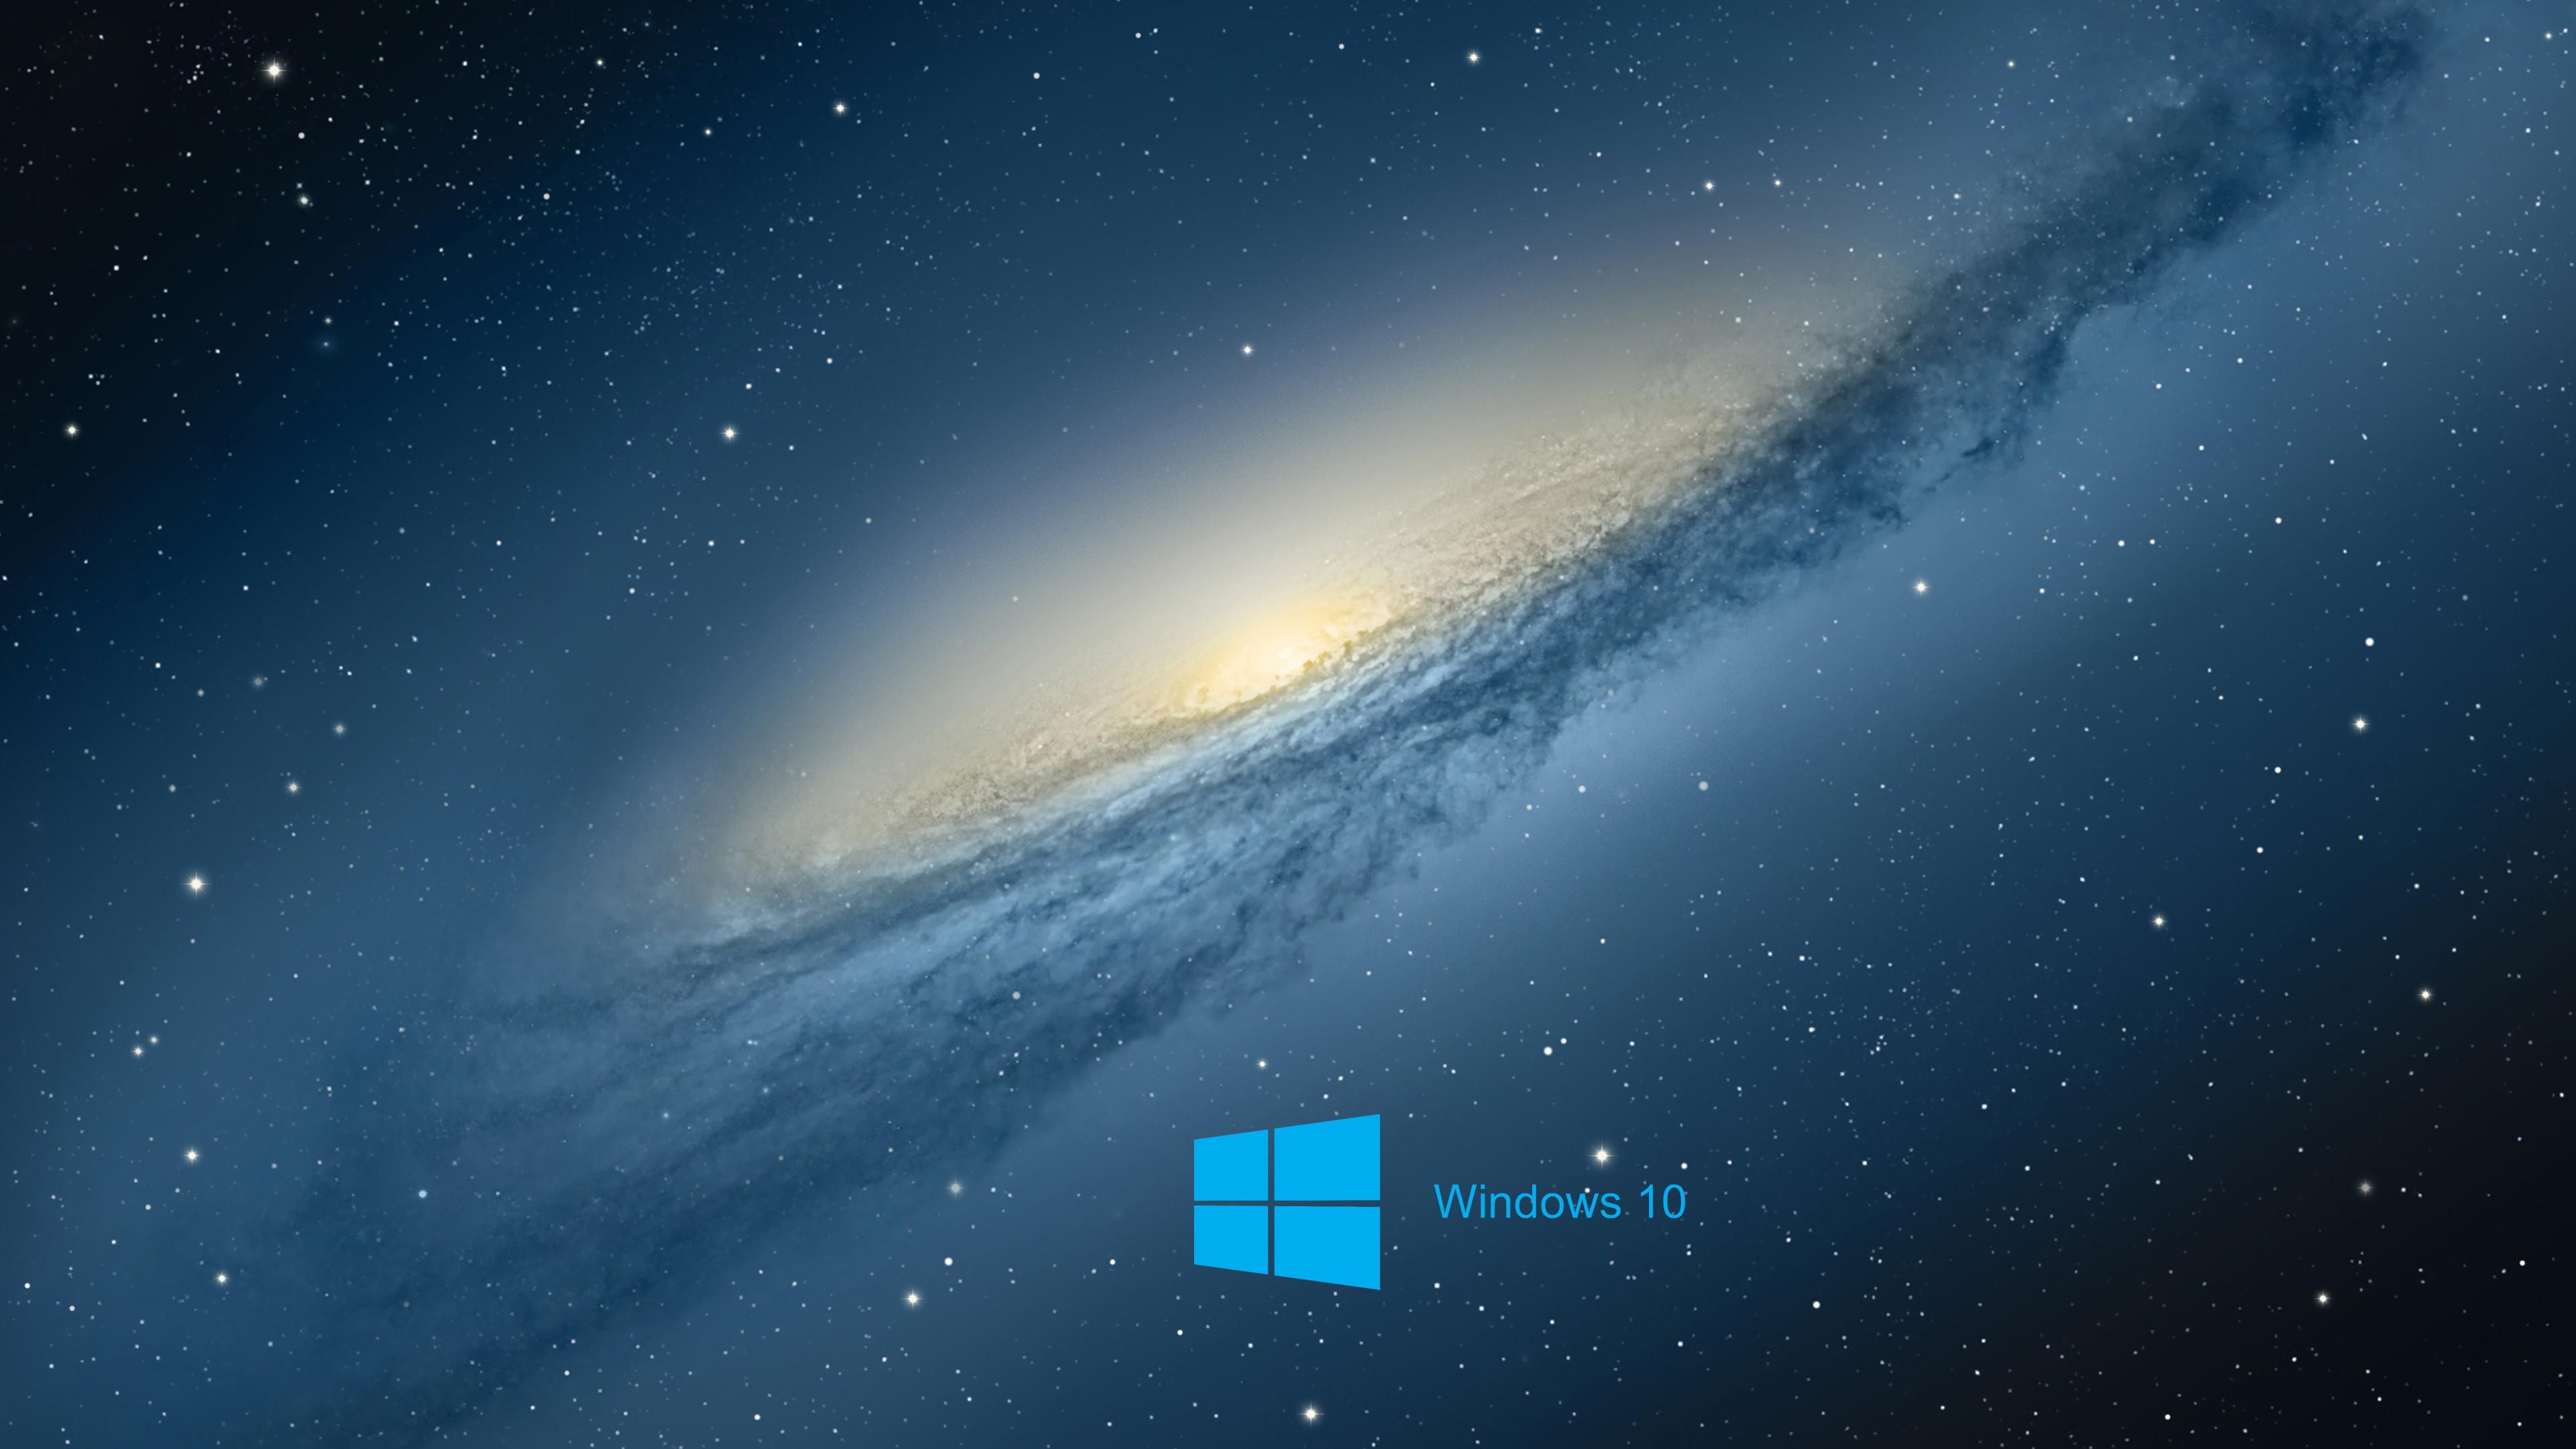 Windows 10 Desktop Background with scientific space planet galaxy .